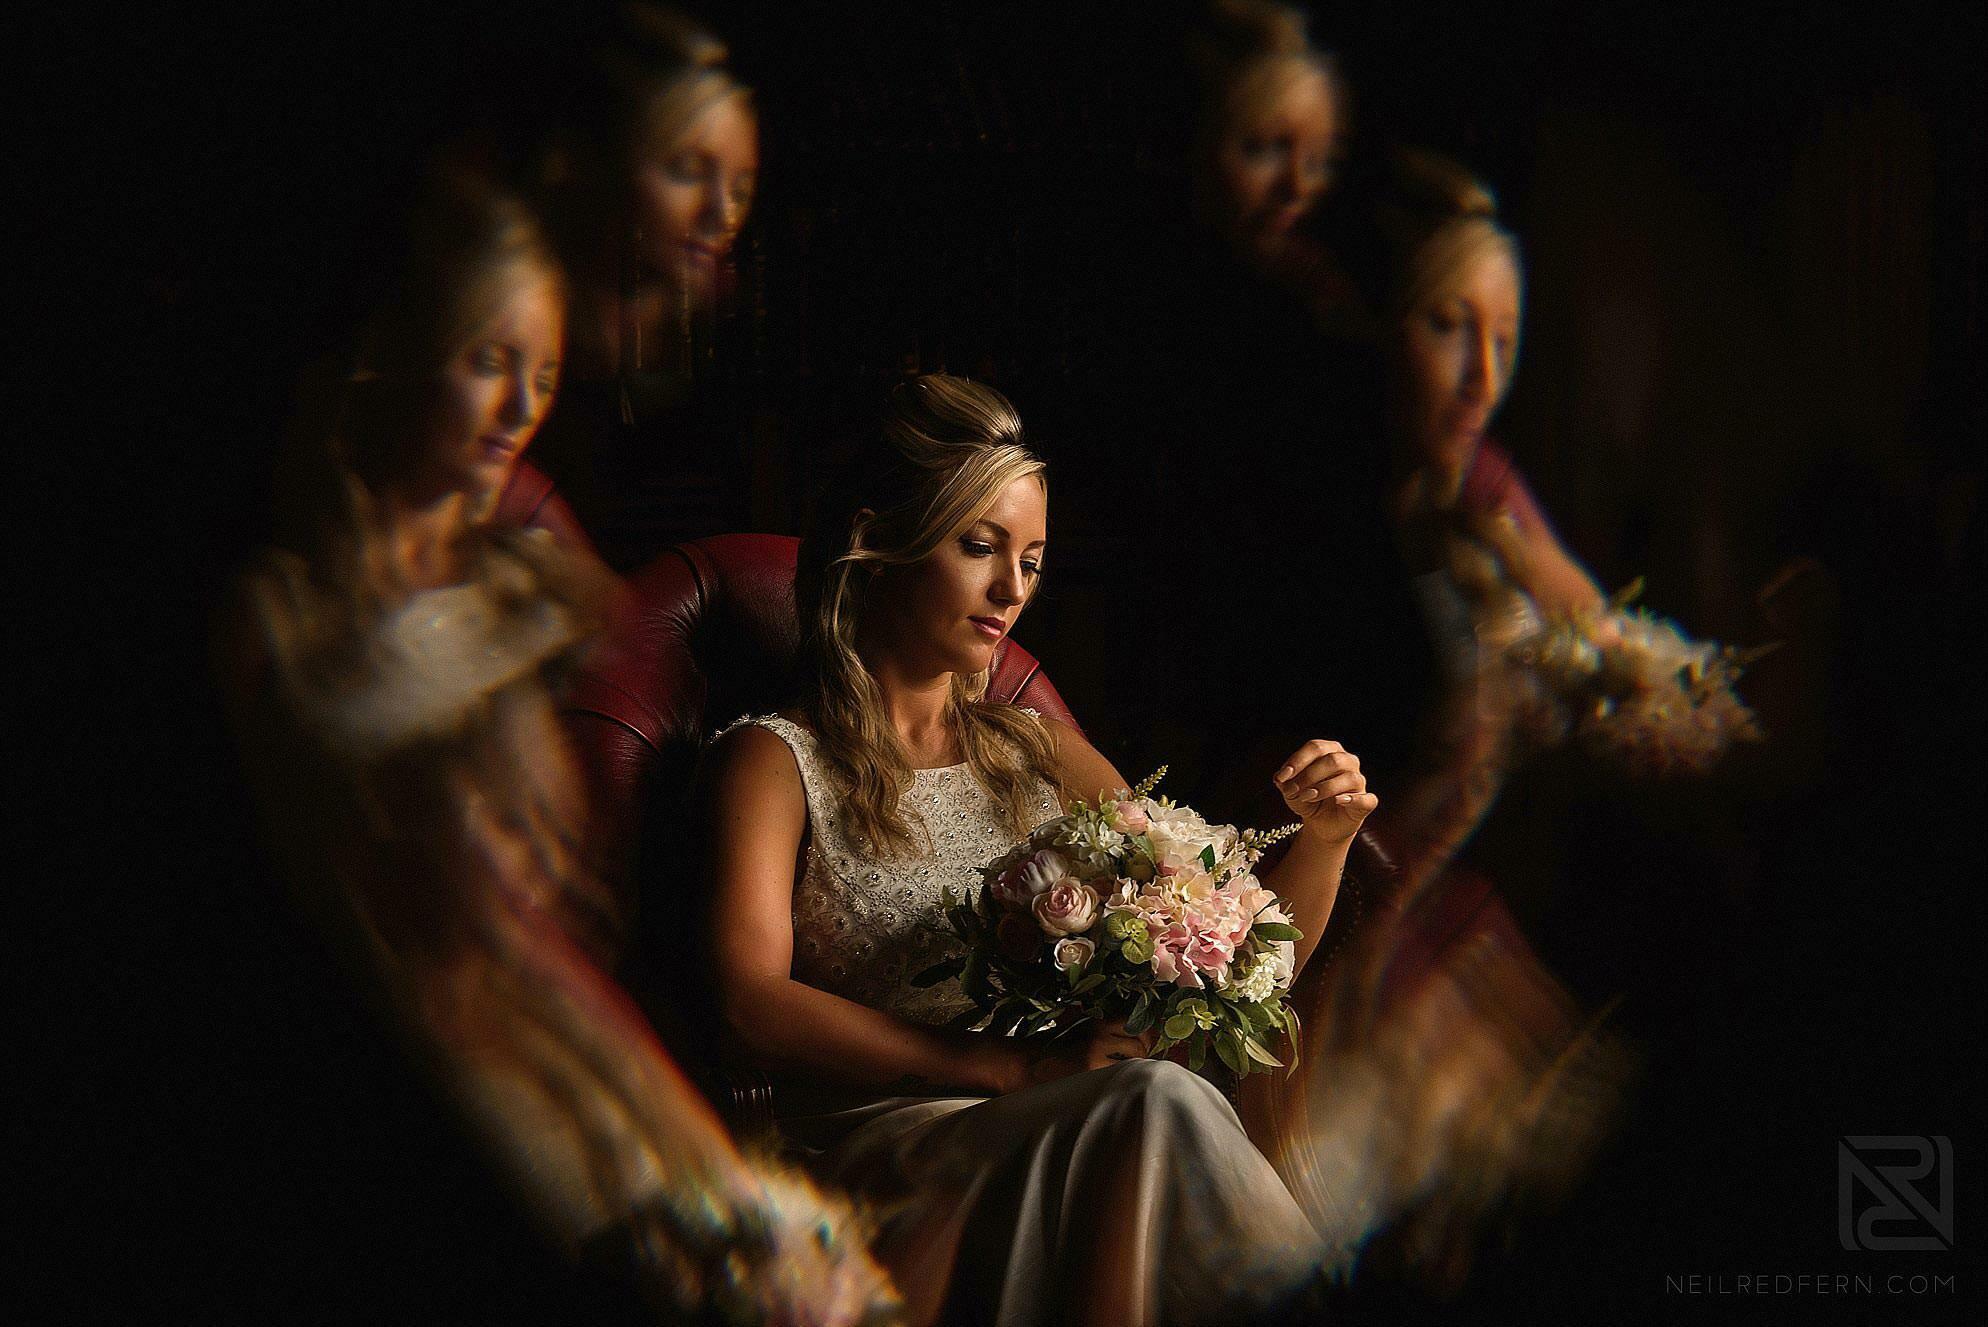 best-wedding-photography-2016-035